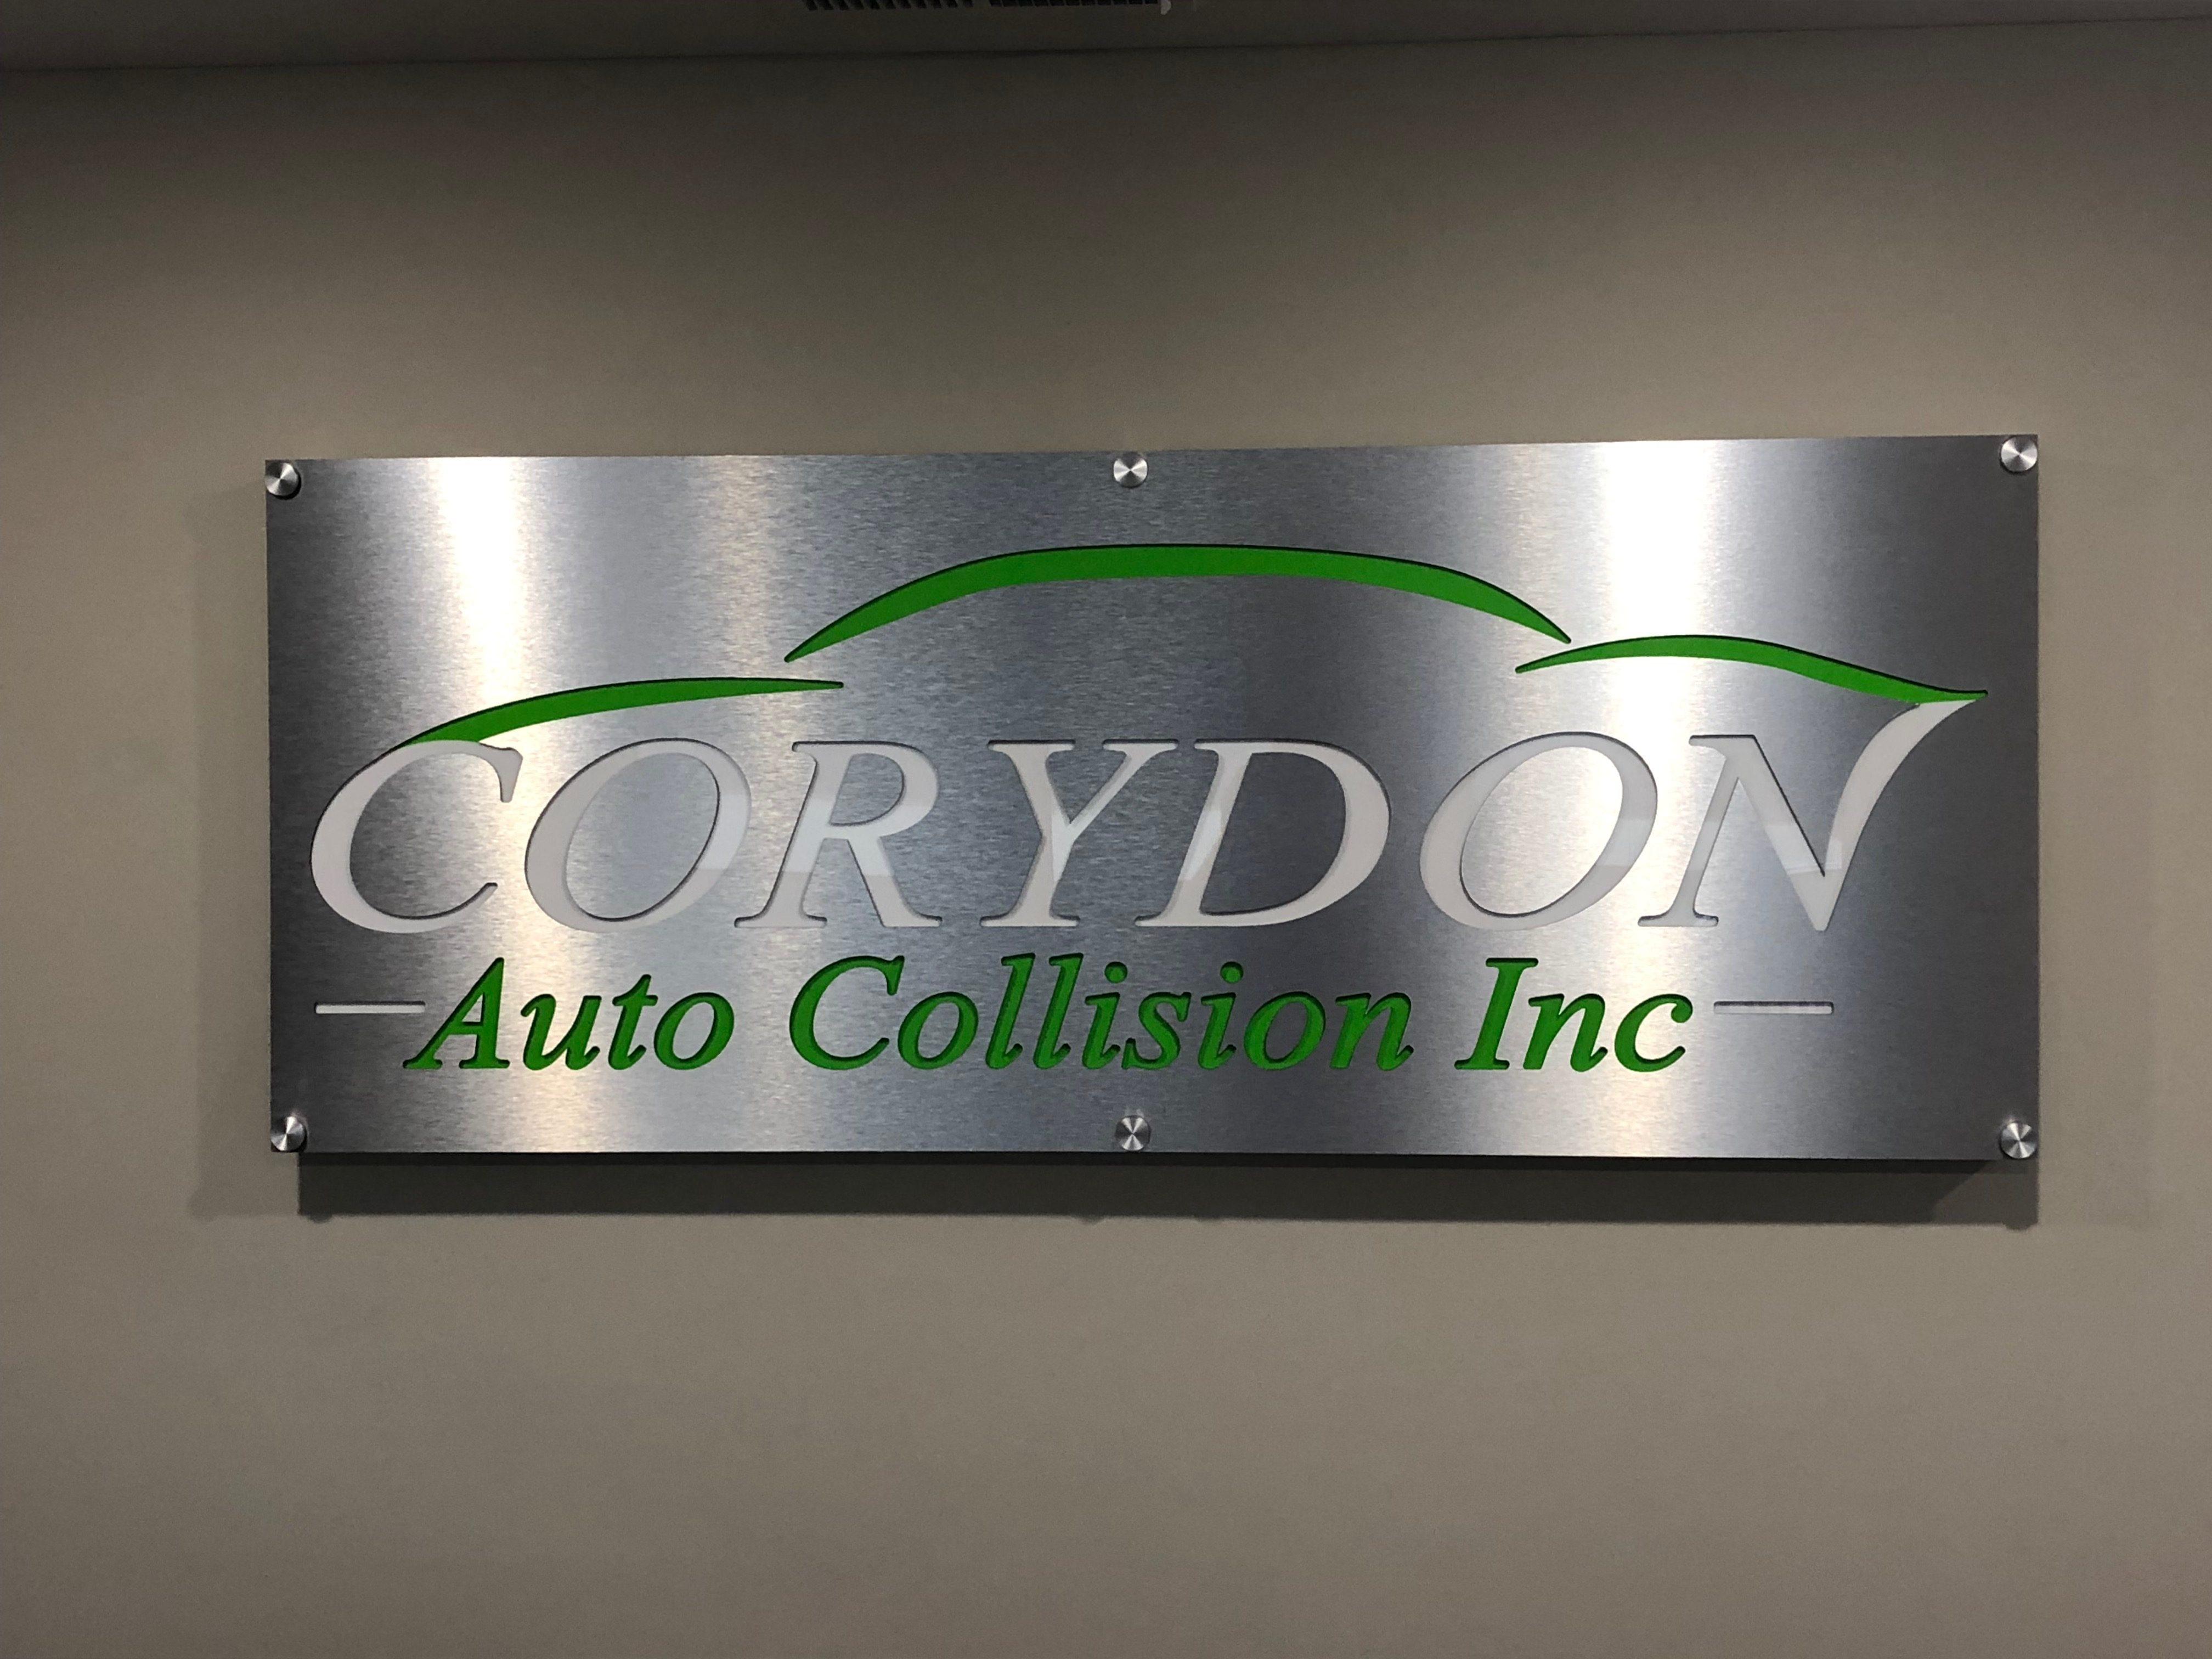 Corydon Auto Collision